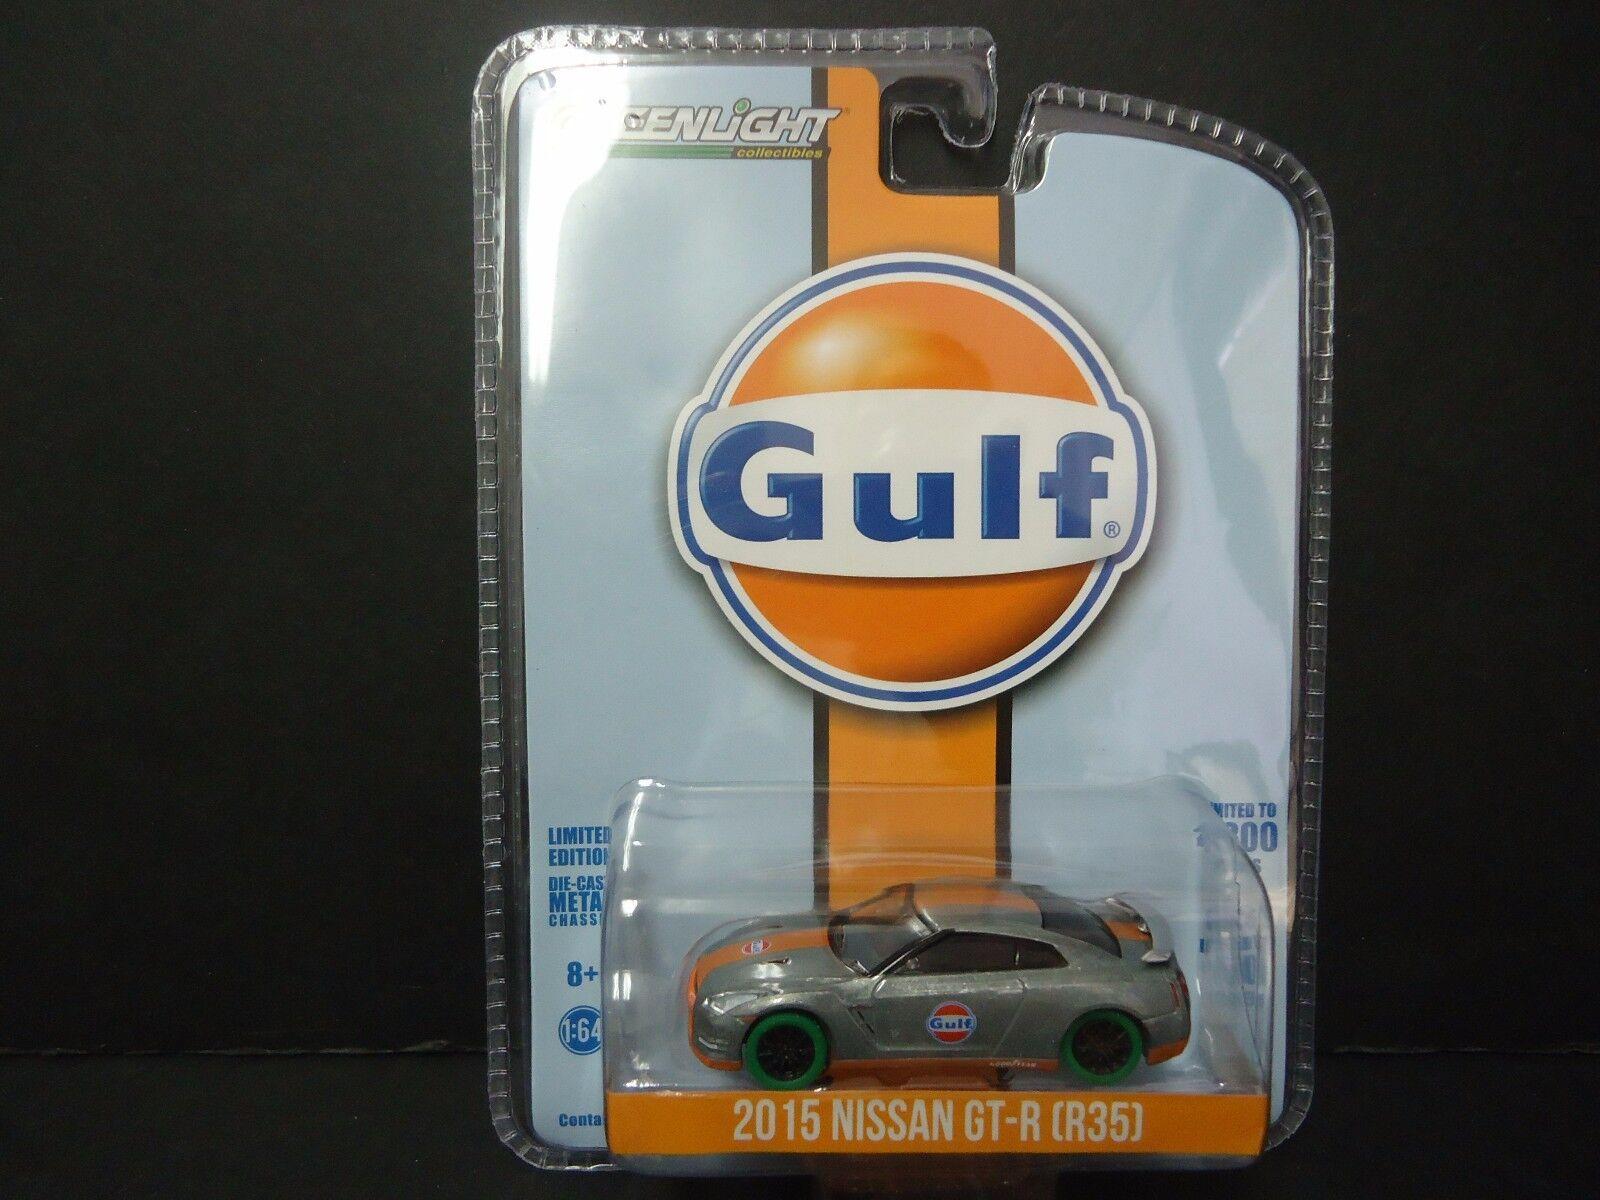 Grünlight - nissan gt - r r 35 zutrifft 2015 gulf oil Grünlight exklusive 1   64 51062 chase